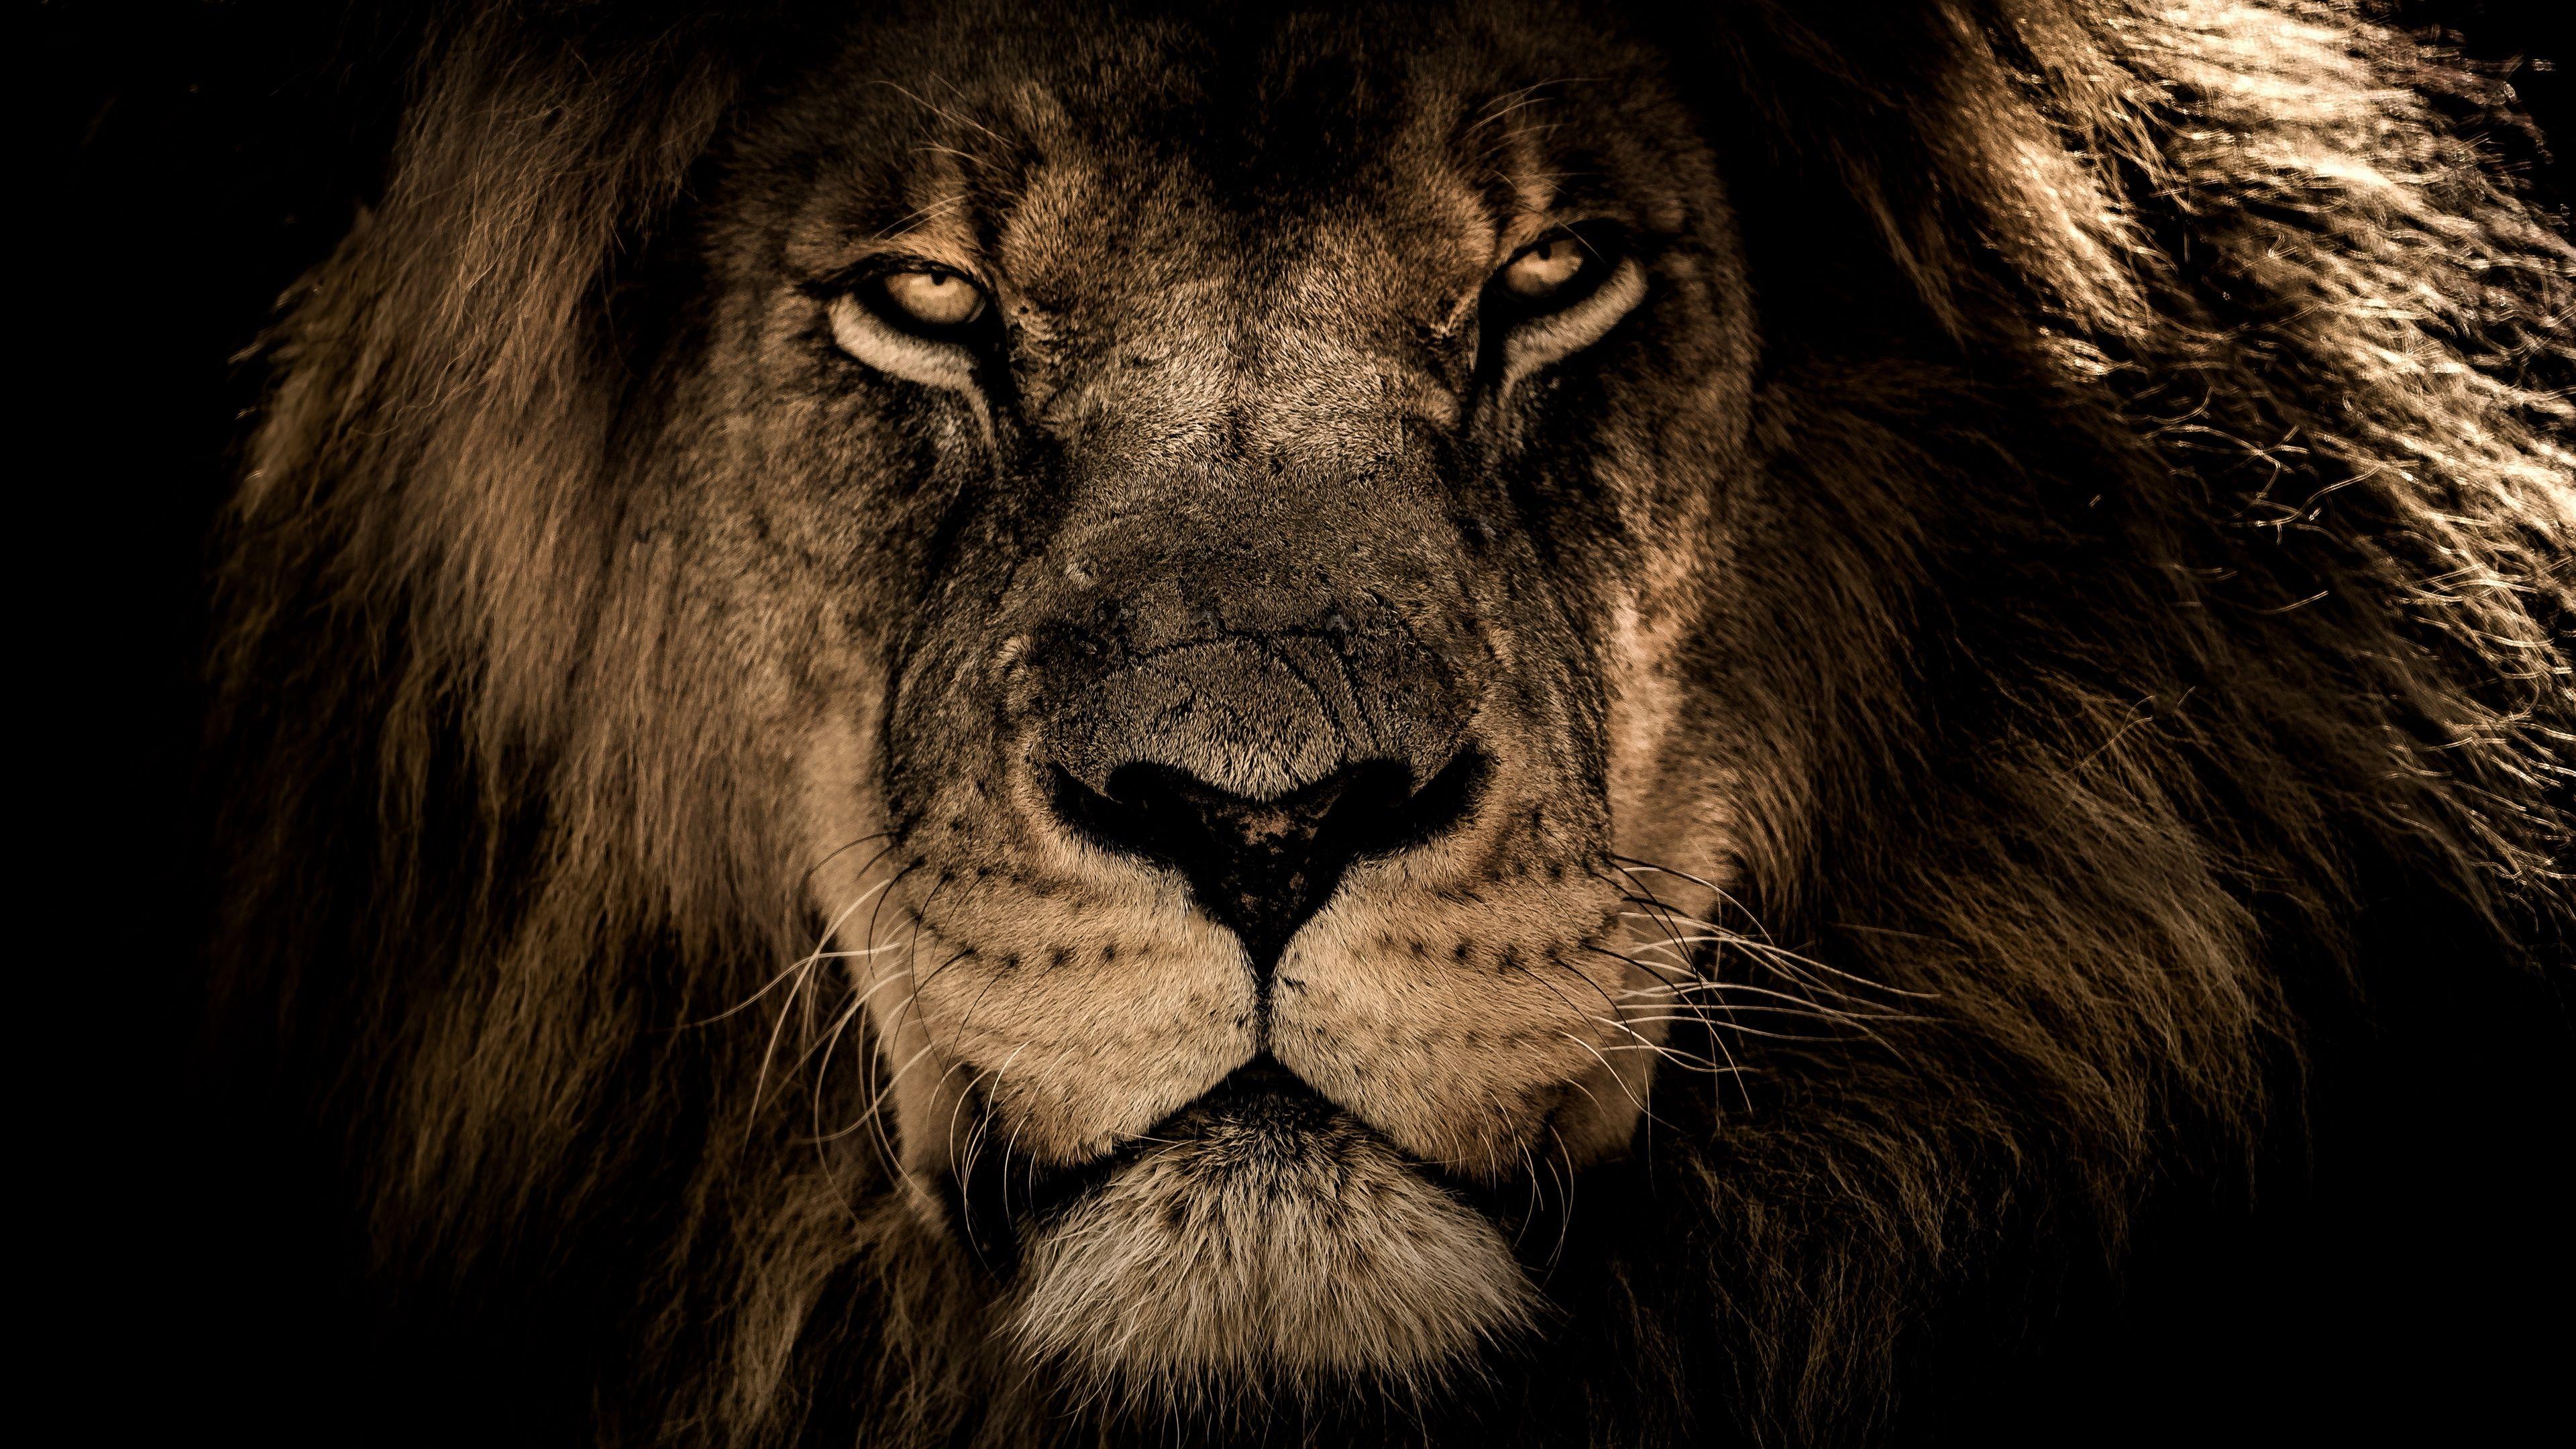 Download Wallpaper Lion, Muzzle, Mane, Predator, Look - Lion Wallpaper 4k - HD Wallpaper